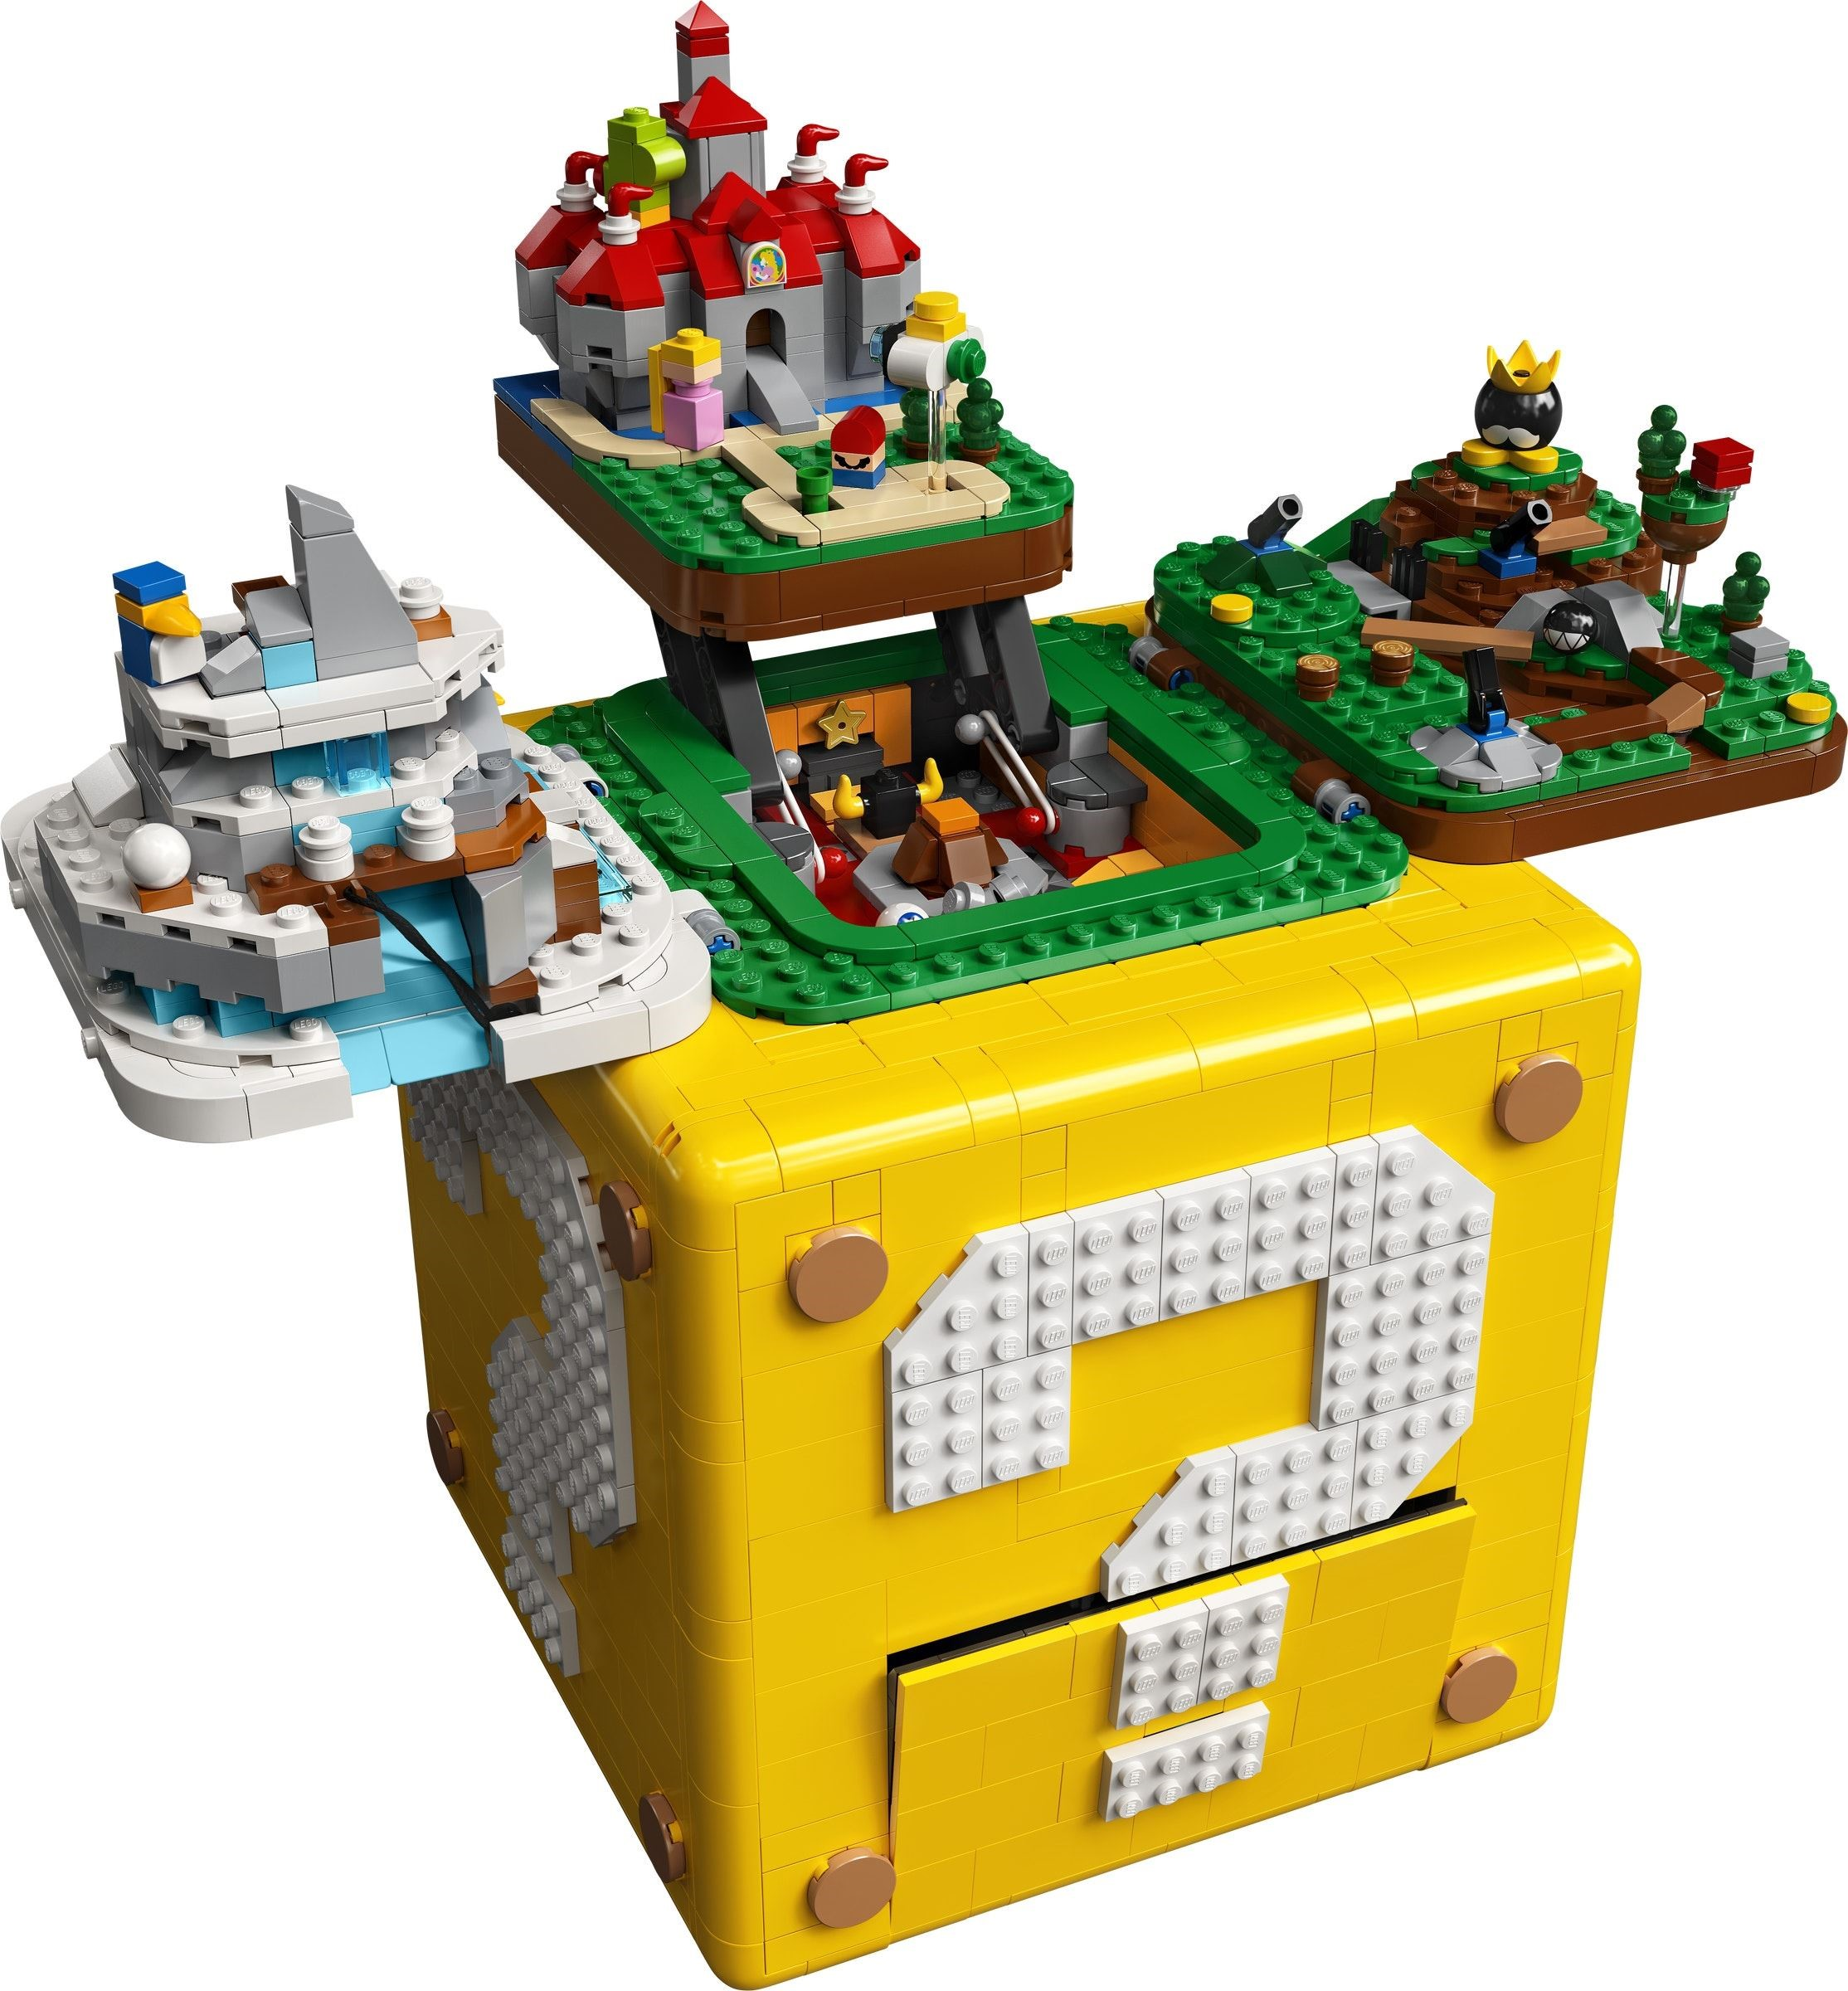 LEGO Blocco punto interrogativo Super Mario 64